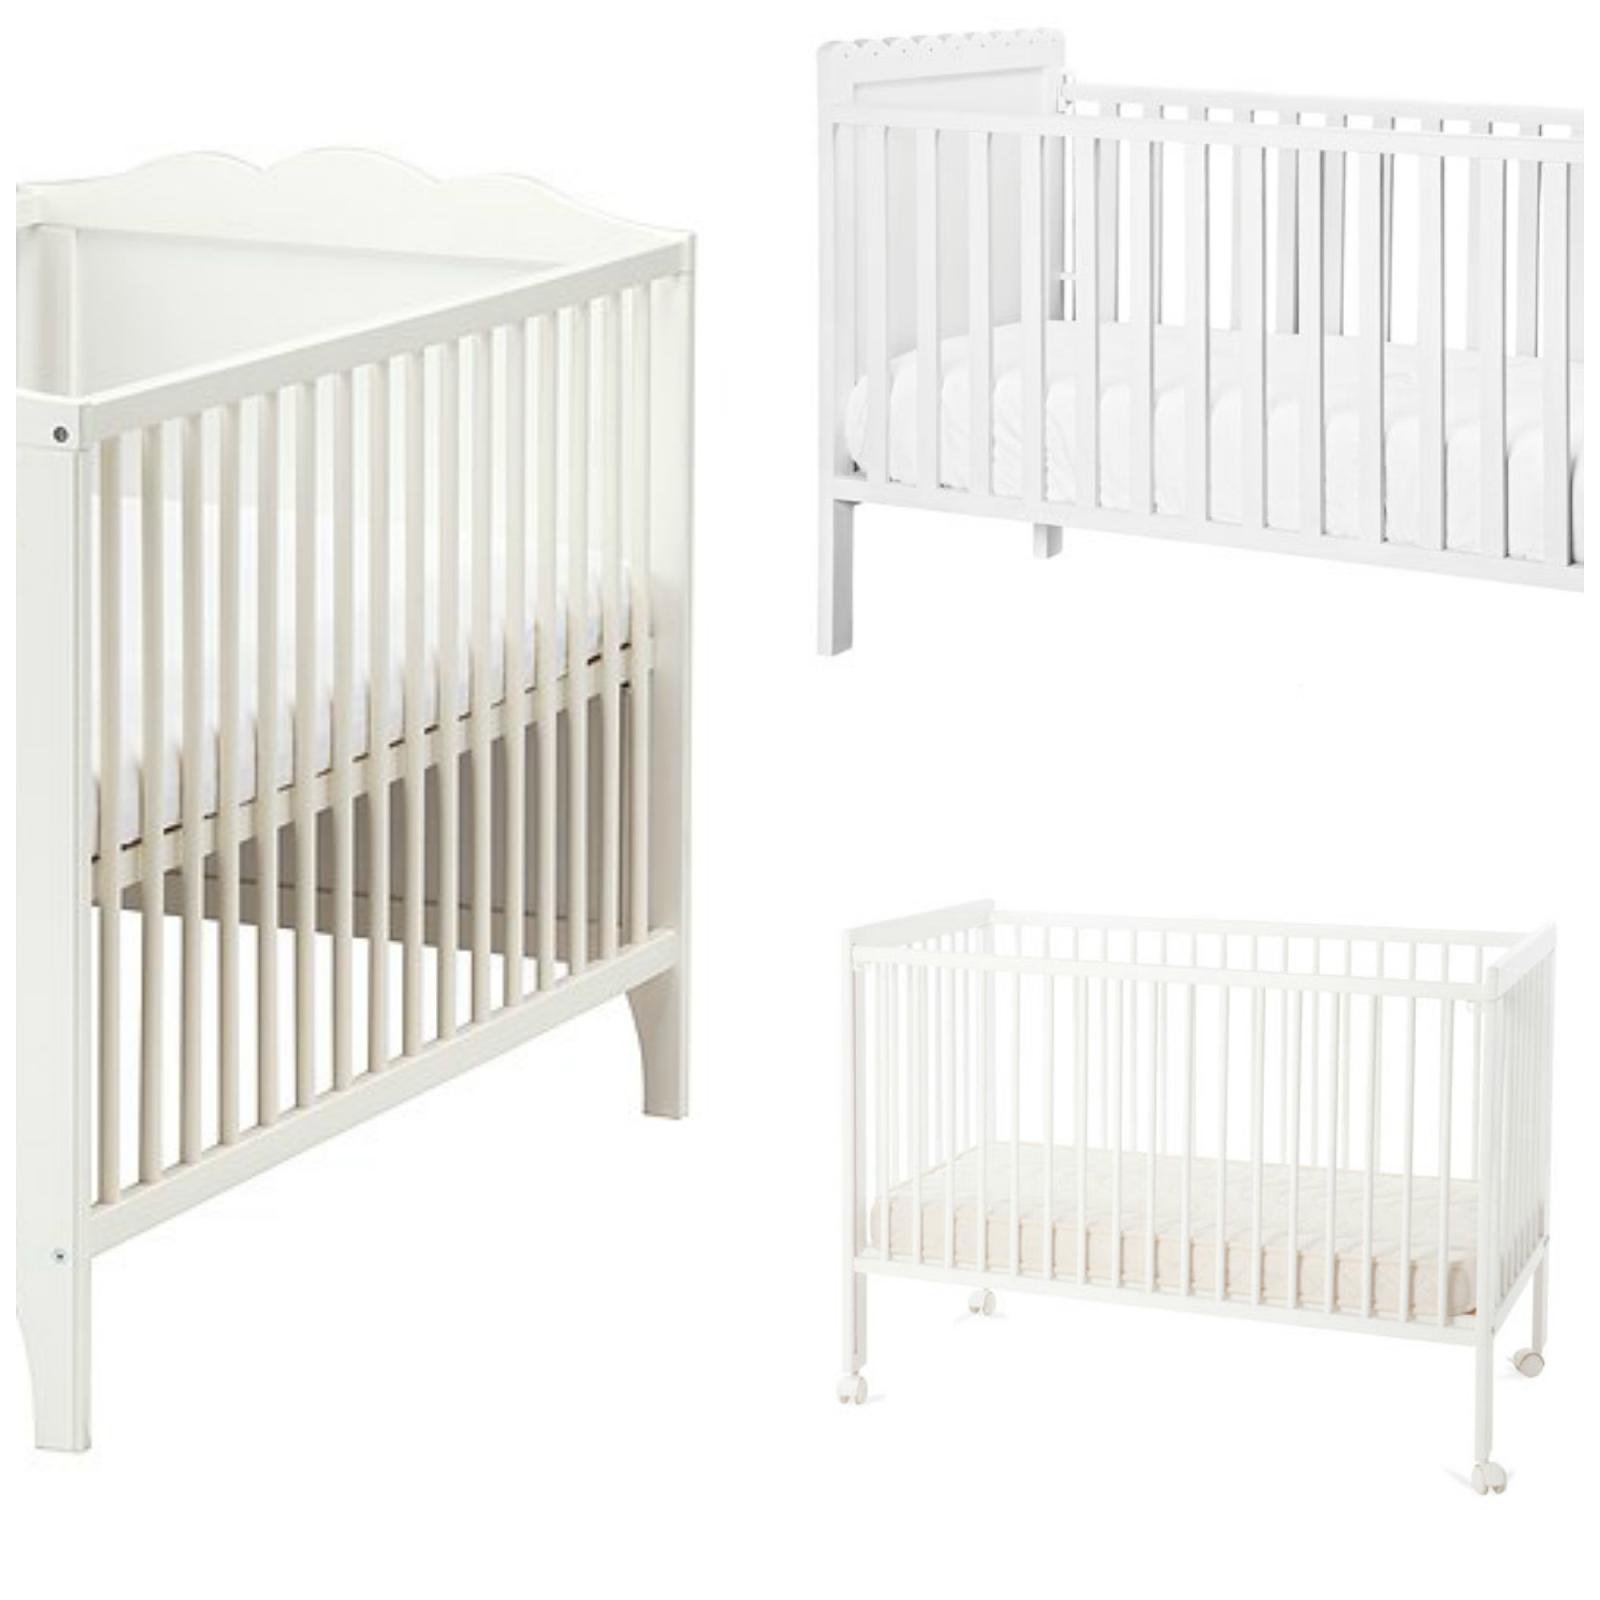 Guia completo de compras para quartos de beb s it s - Camas para bebe ...